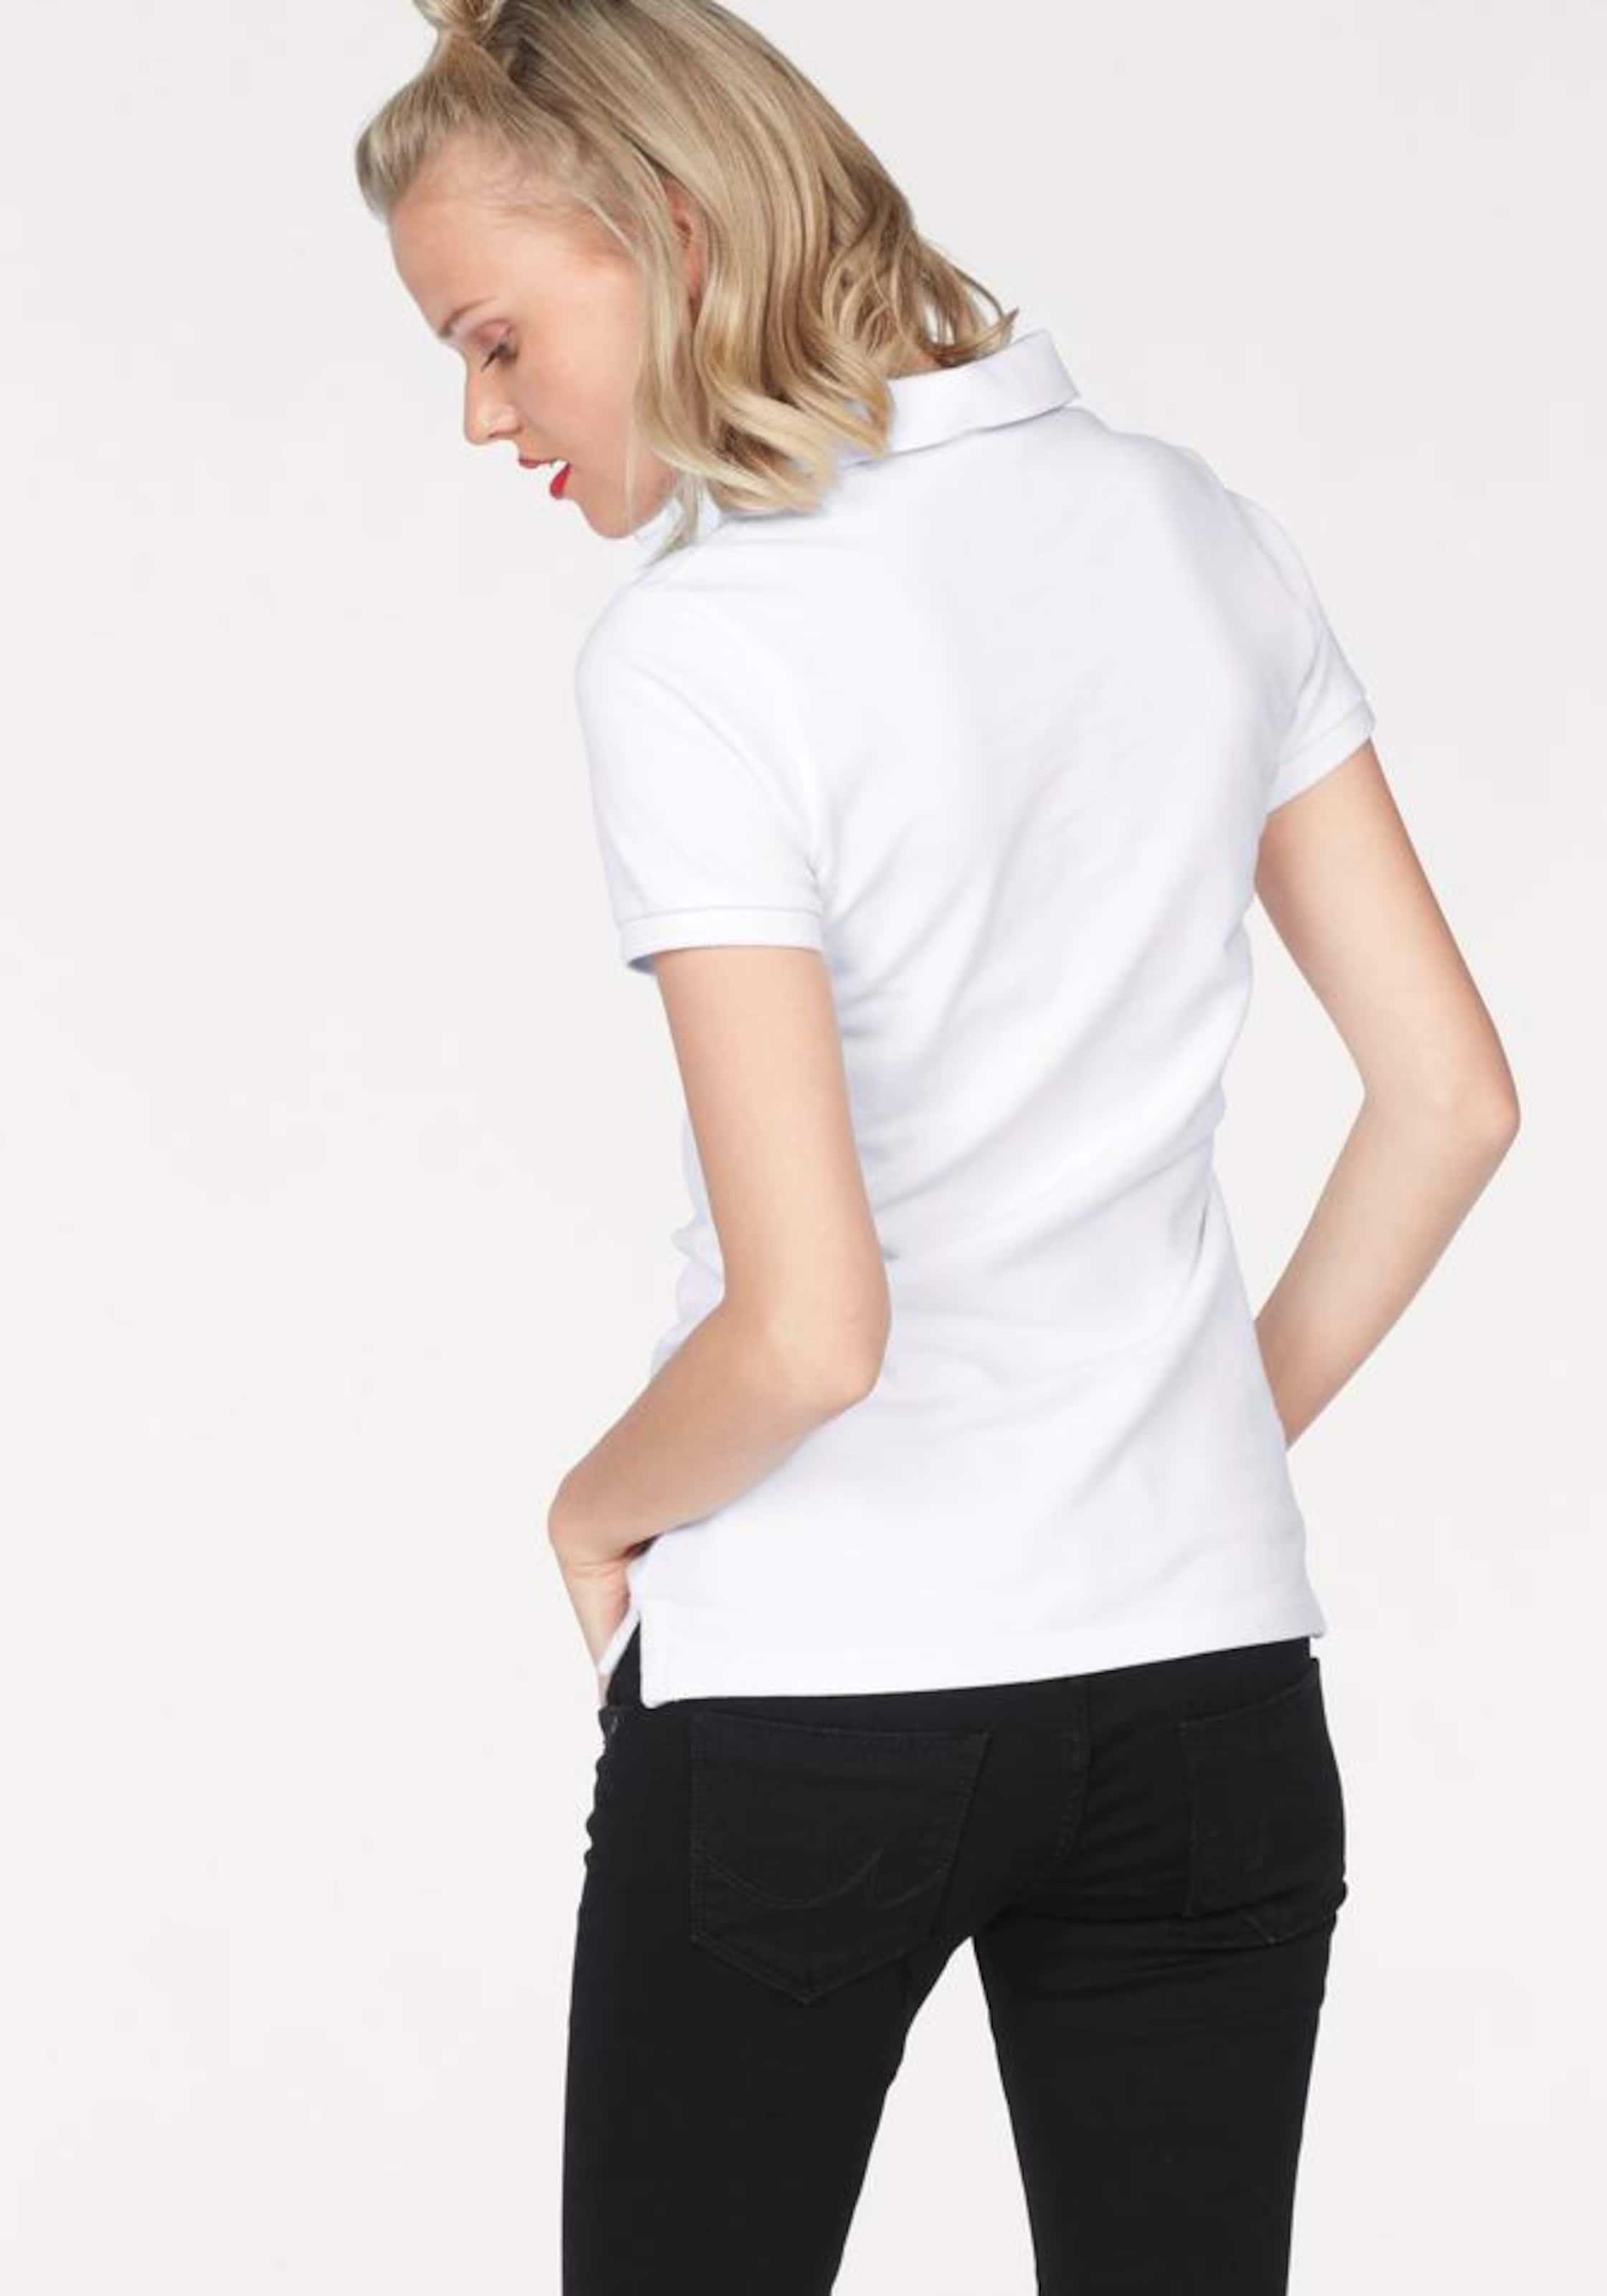 Profi Zu Verkaufen LTB Poloshirt 'ZADOTI' Billig Limited Edition gLbmpSCi